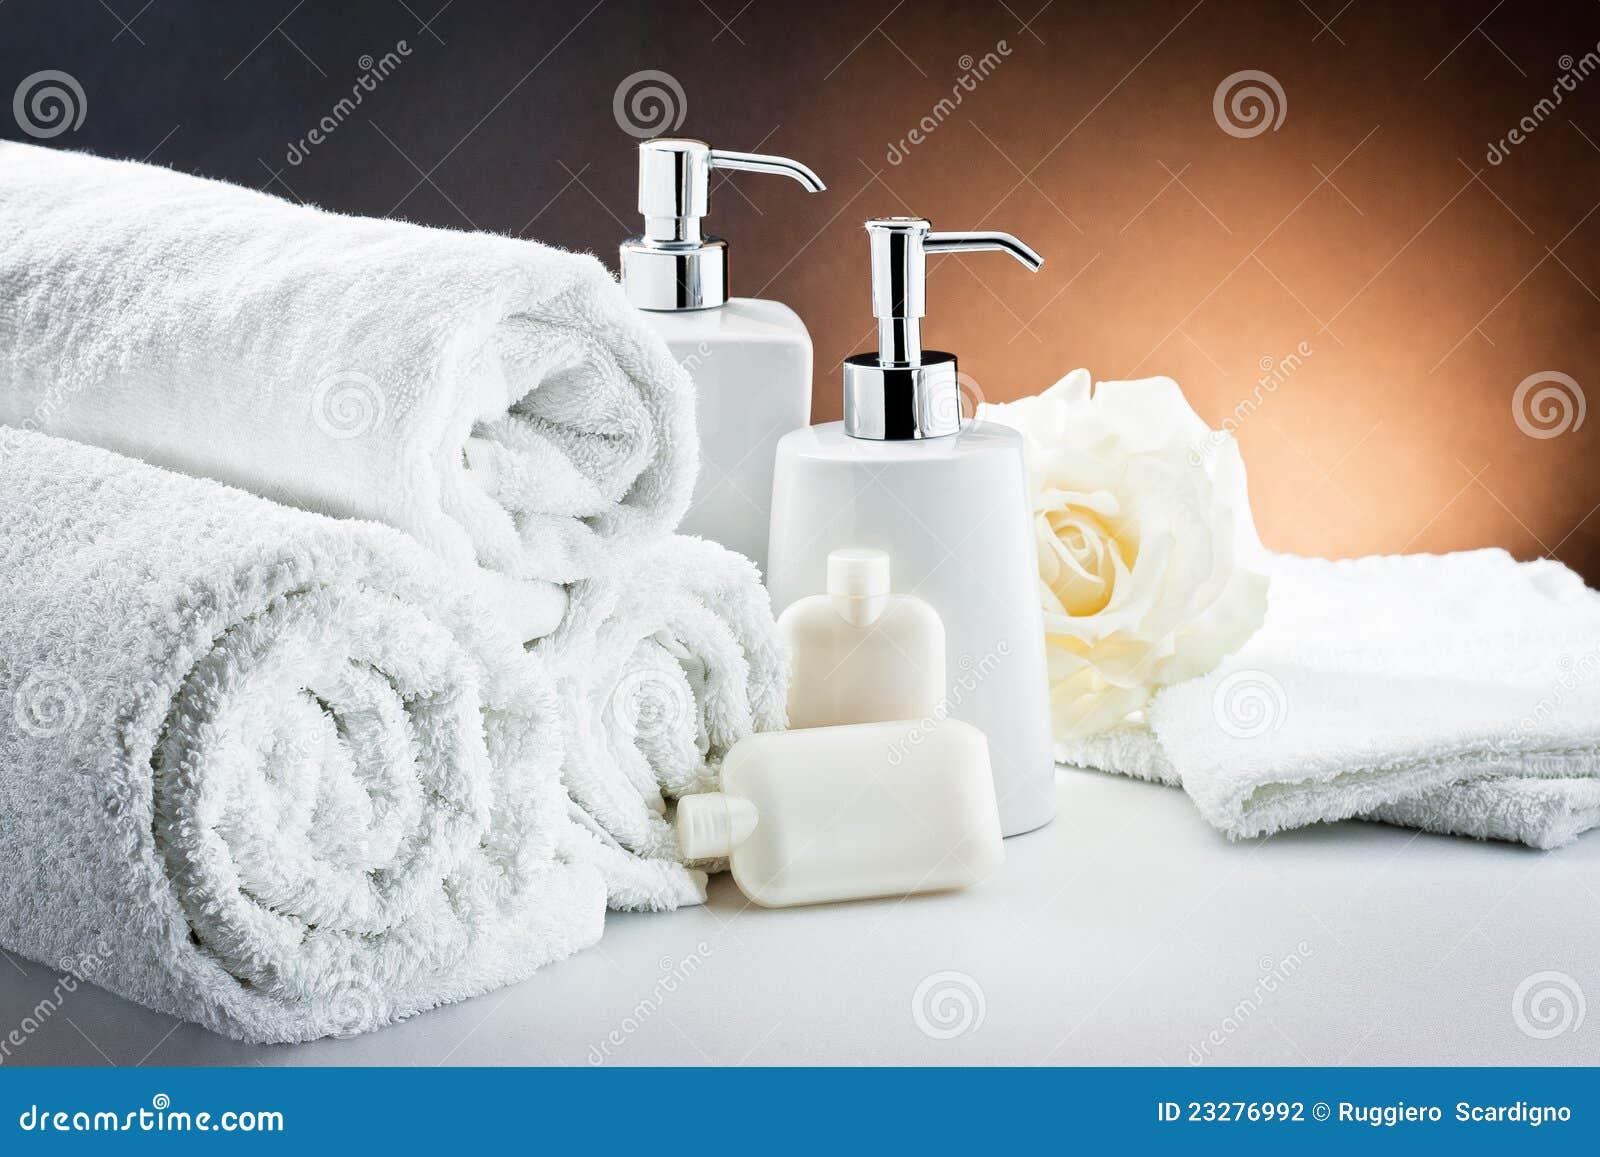 White Accessories Bathroom Hygiene Stock Photo - Image of harmony ...